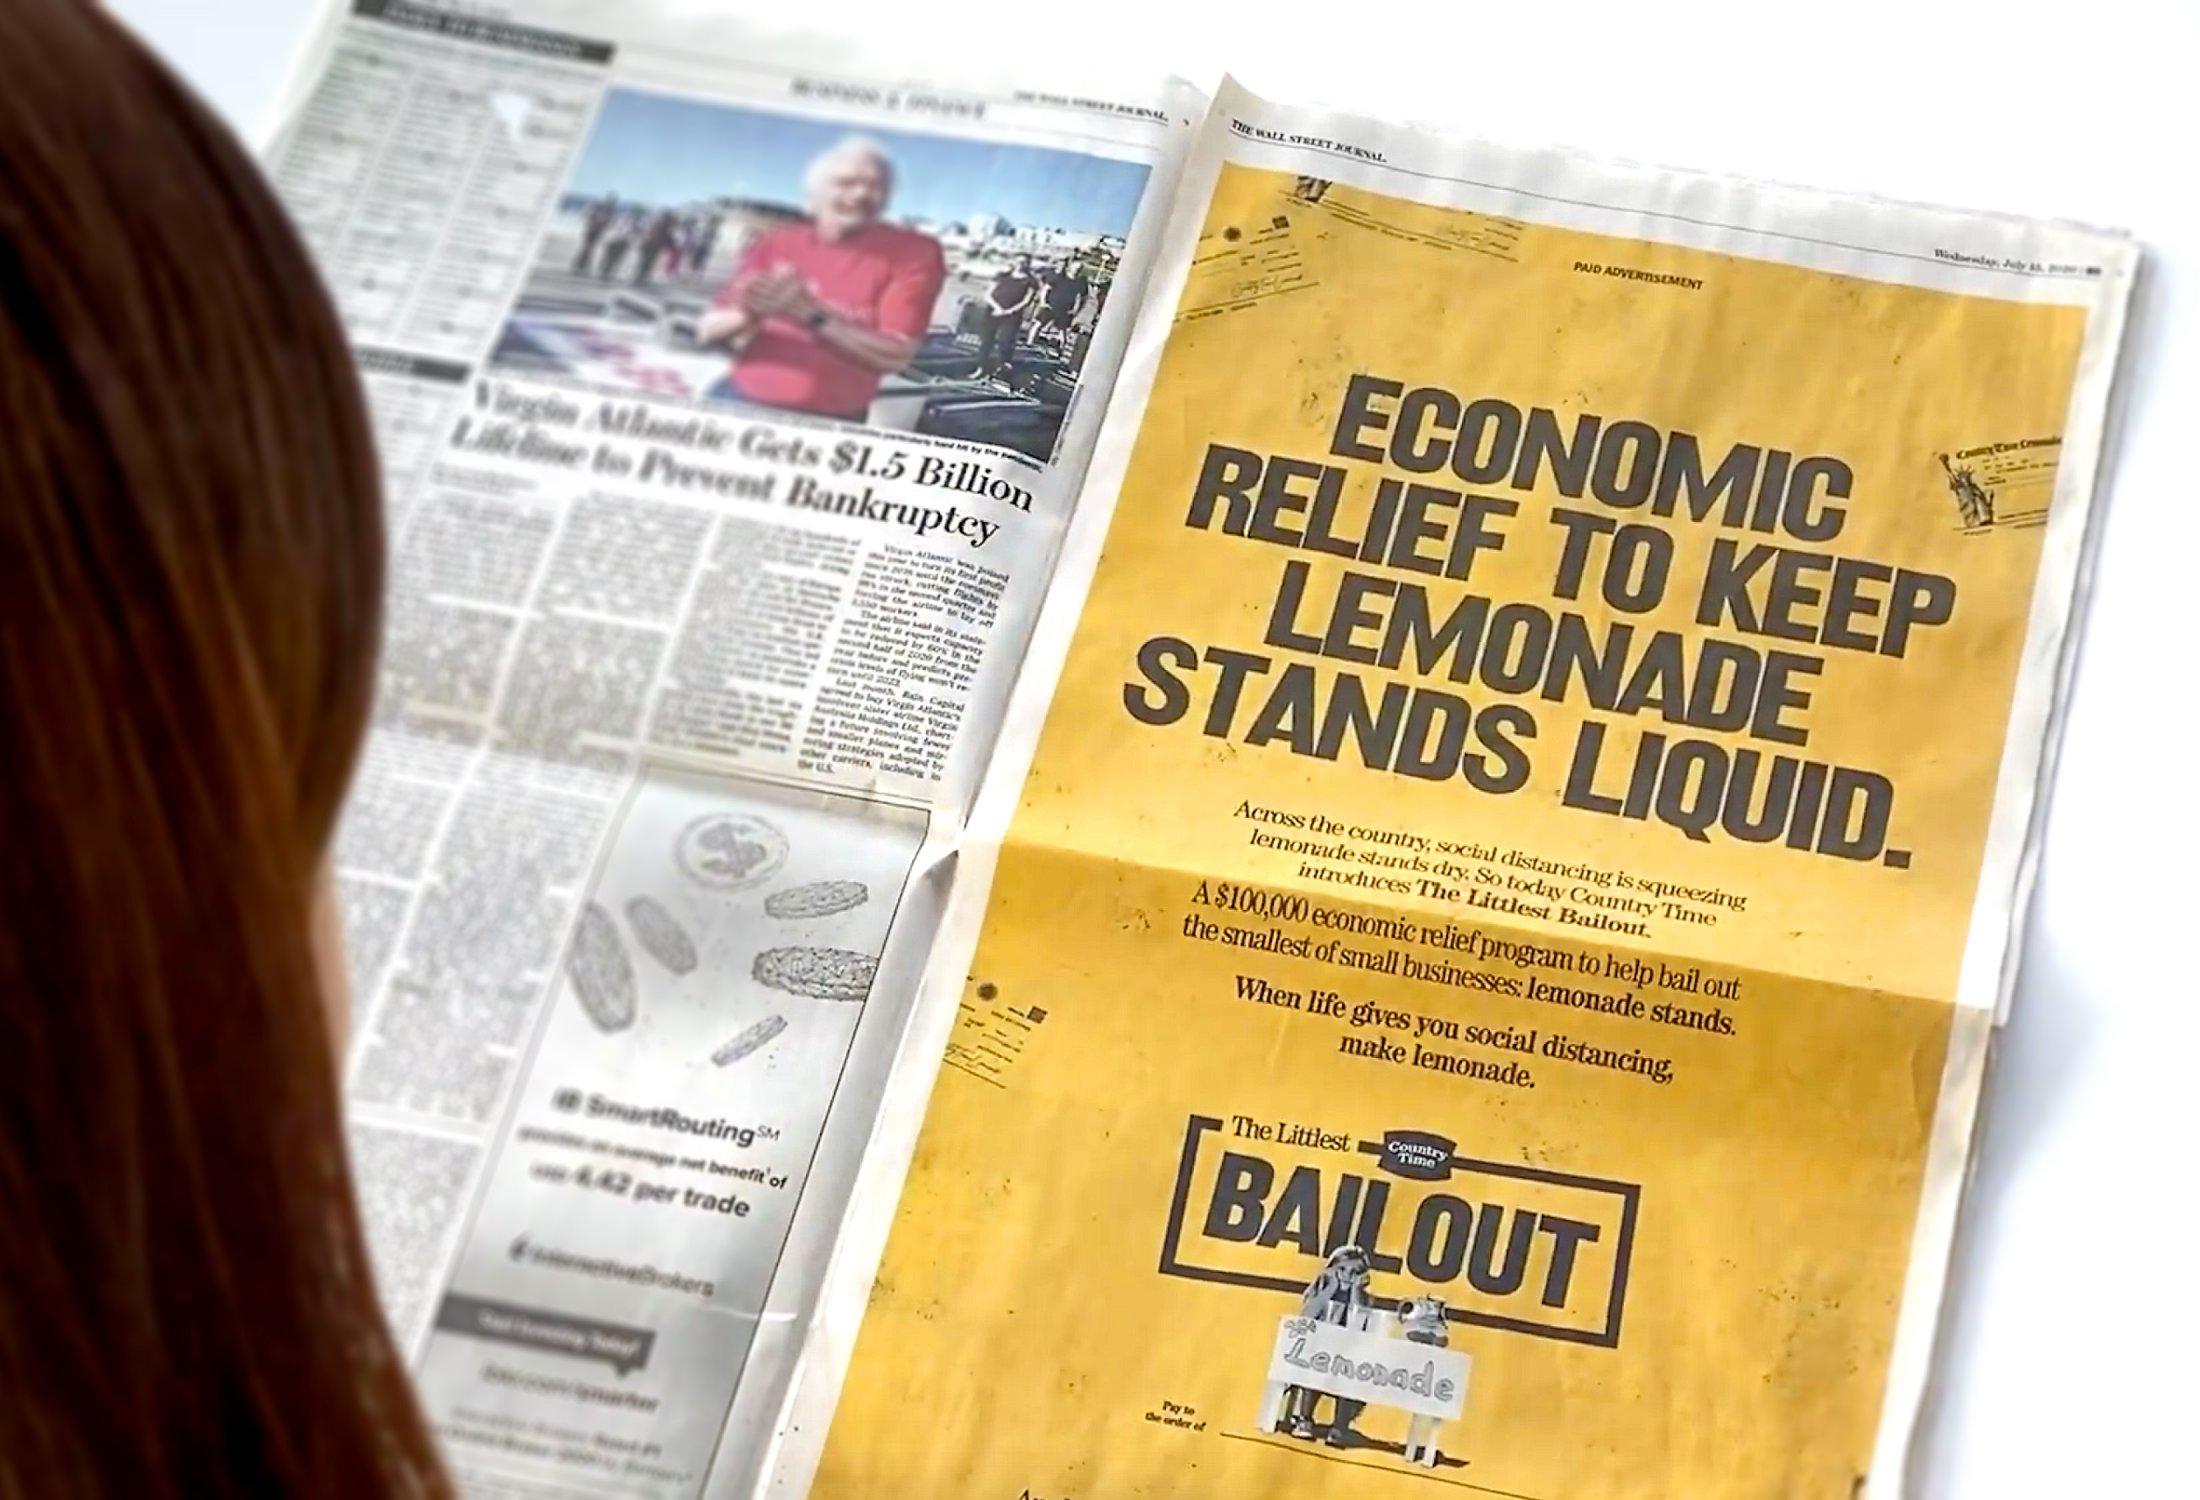 Thumbnail for Littlest Bailout